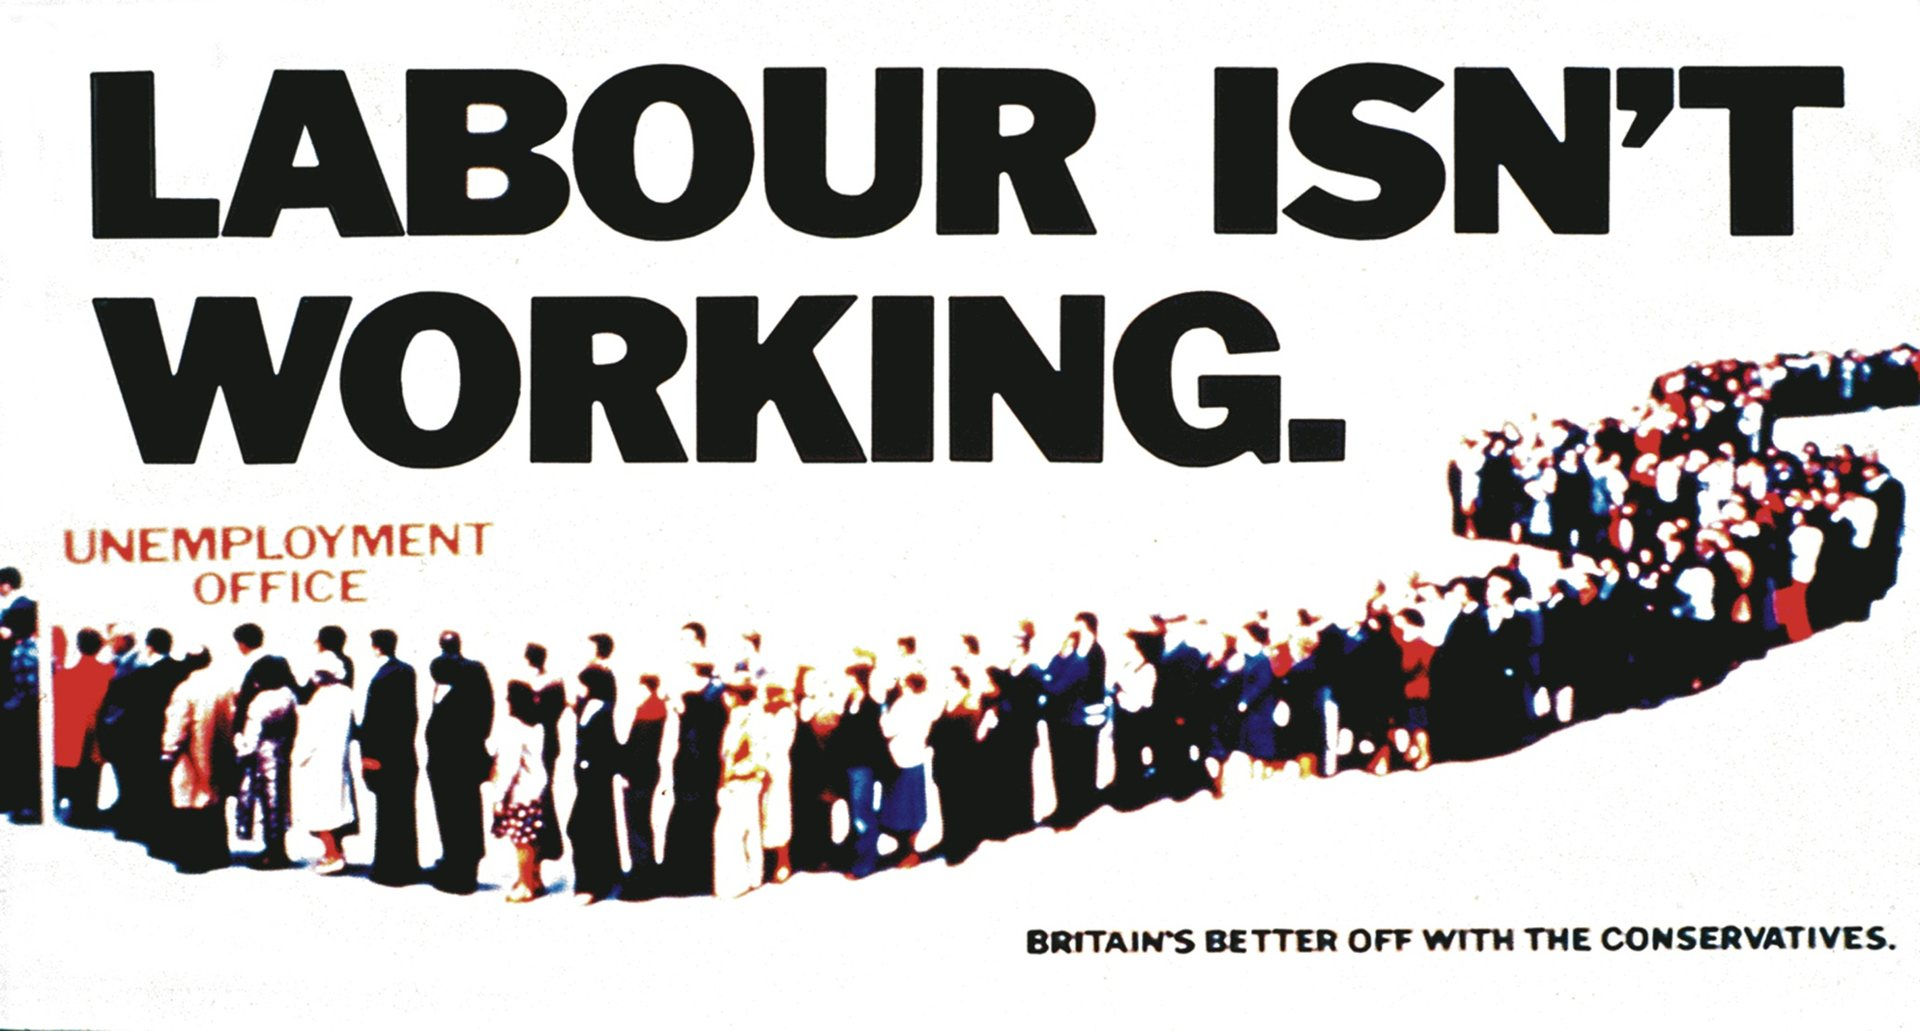 LabourIsntWorking